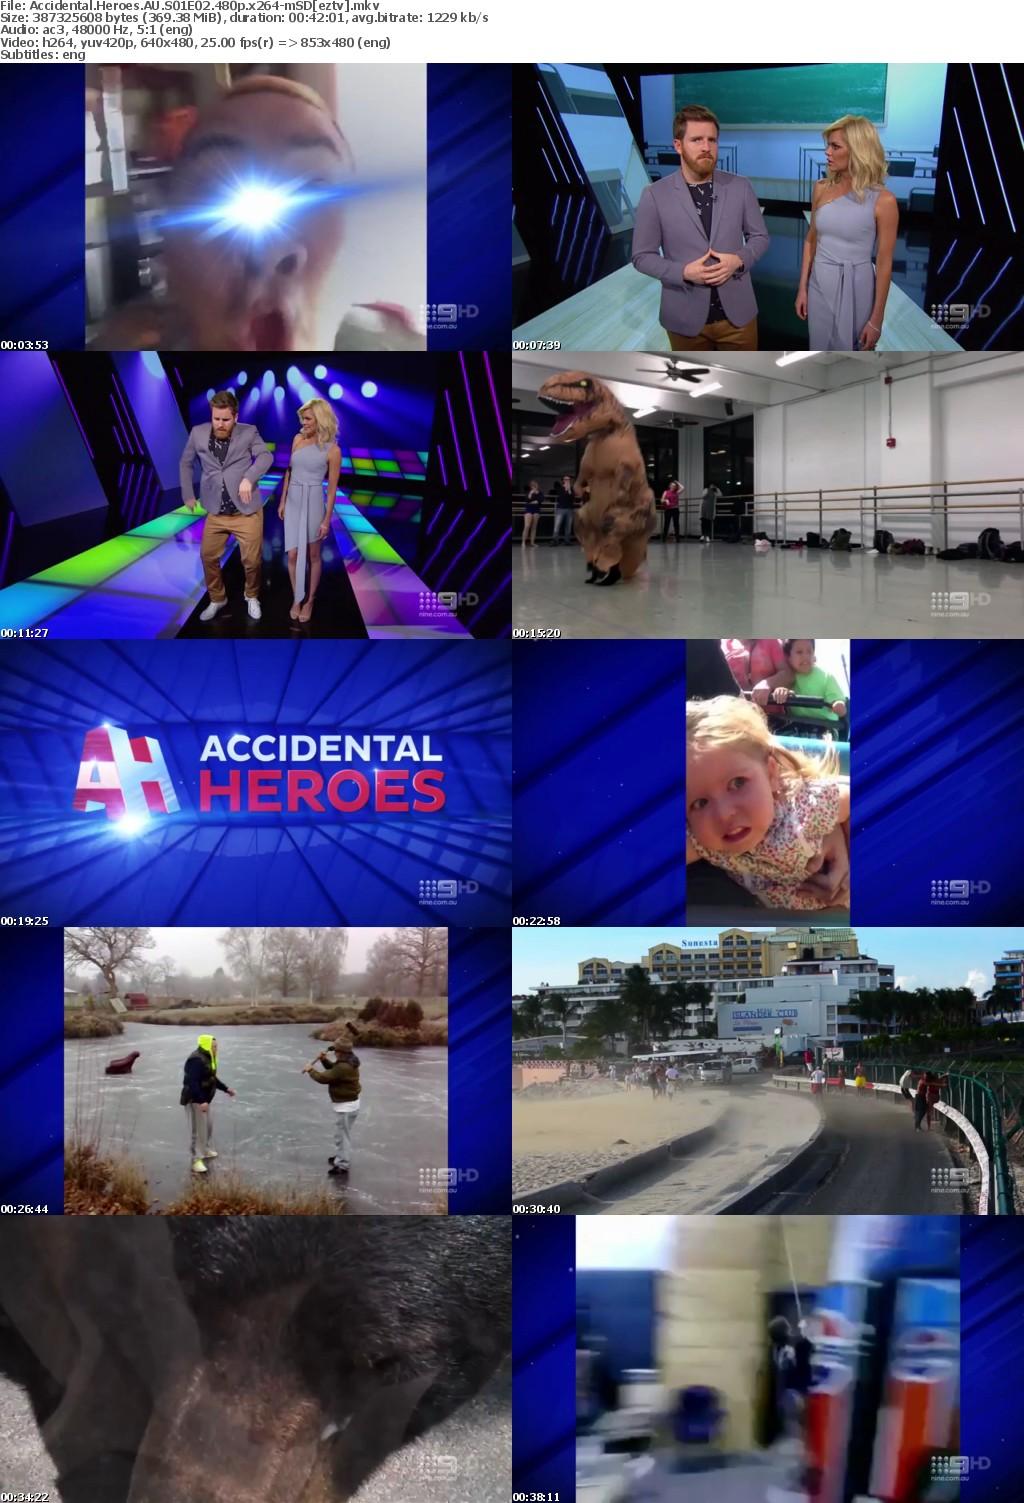 Accidental Heroes AU S01E02 480p x264-mSD